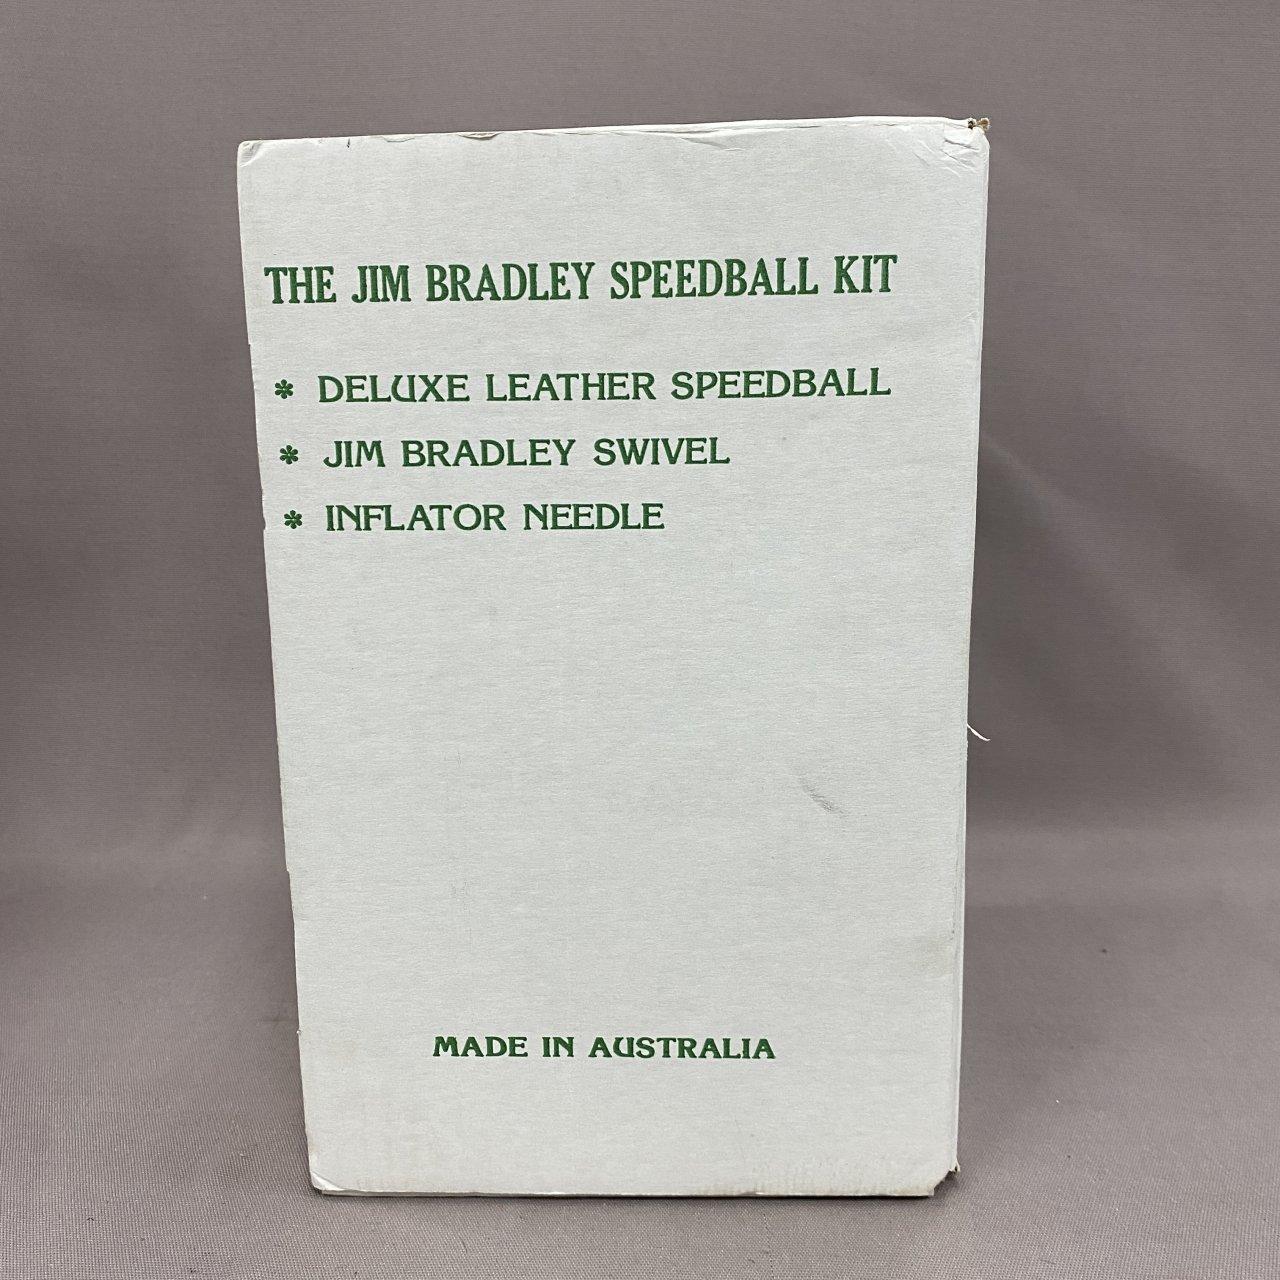 Jim Bradley Black Leather SpeedBall Kit